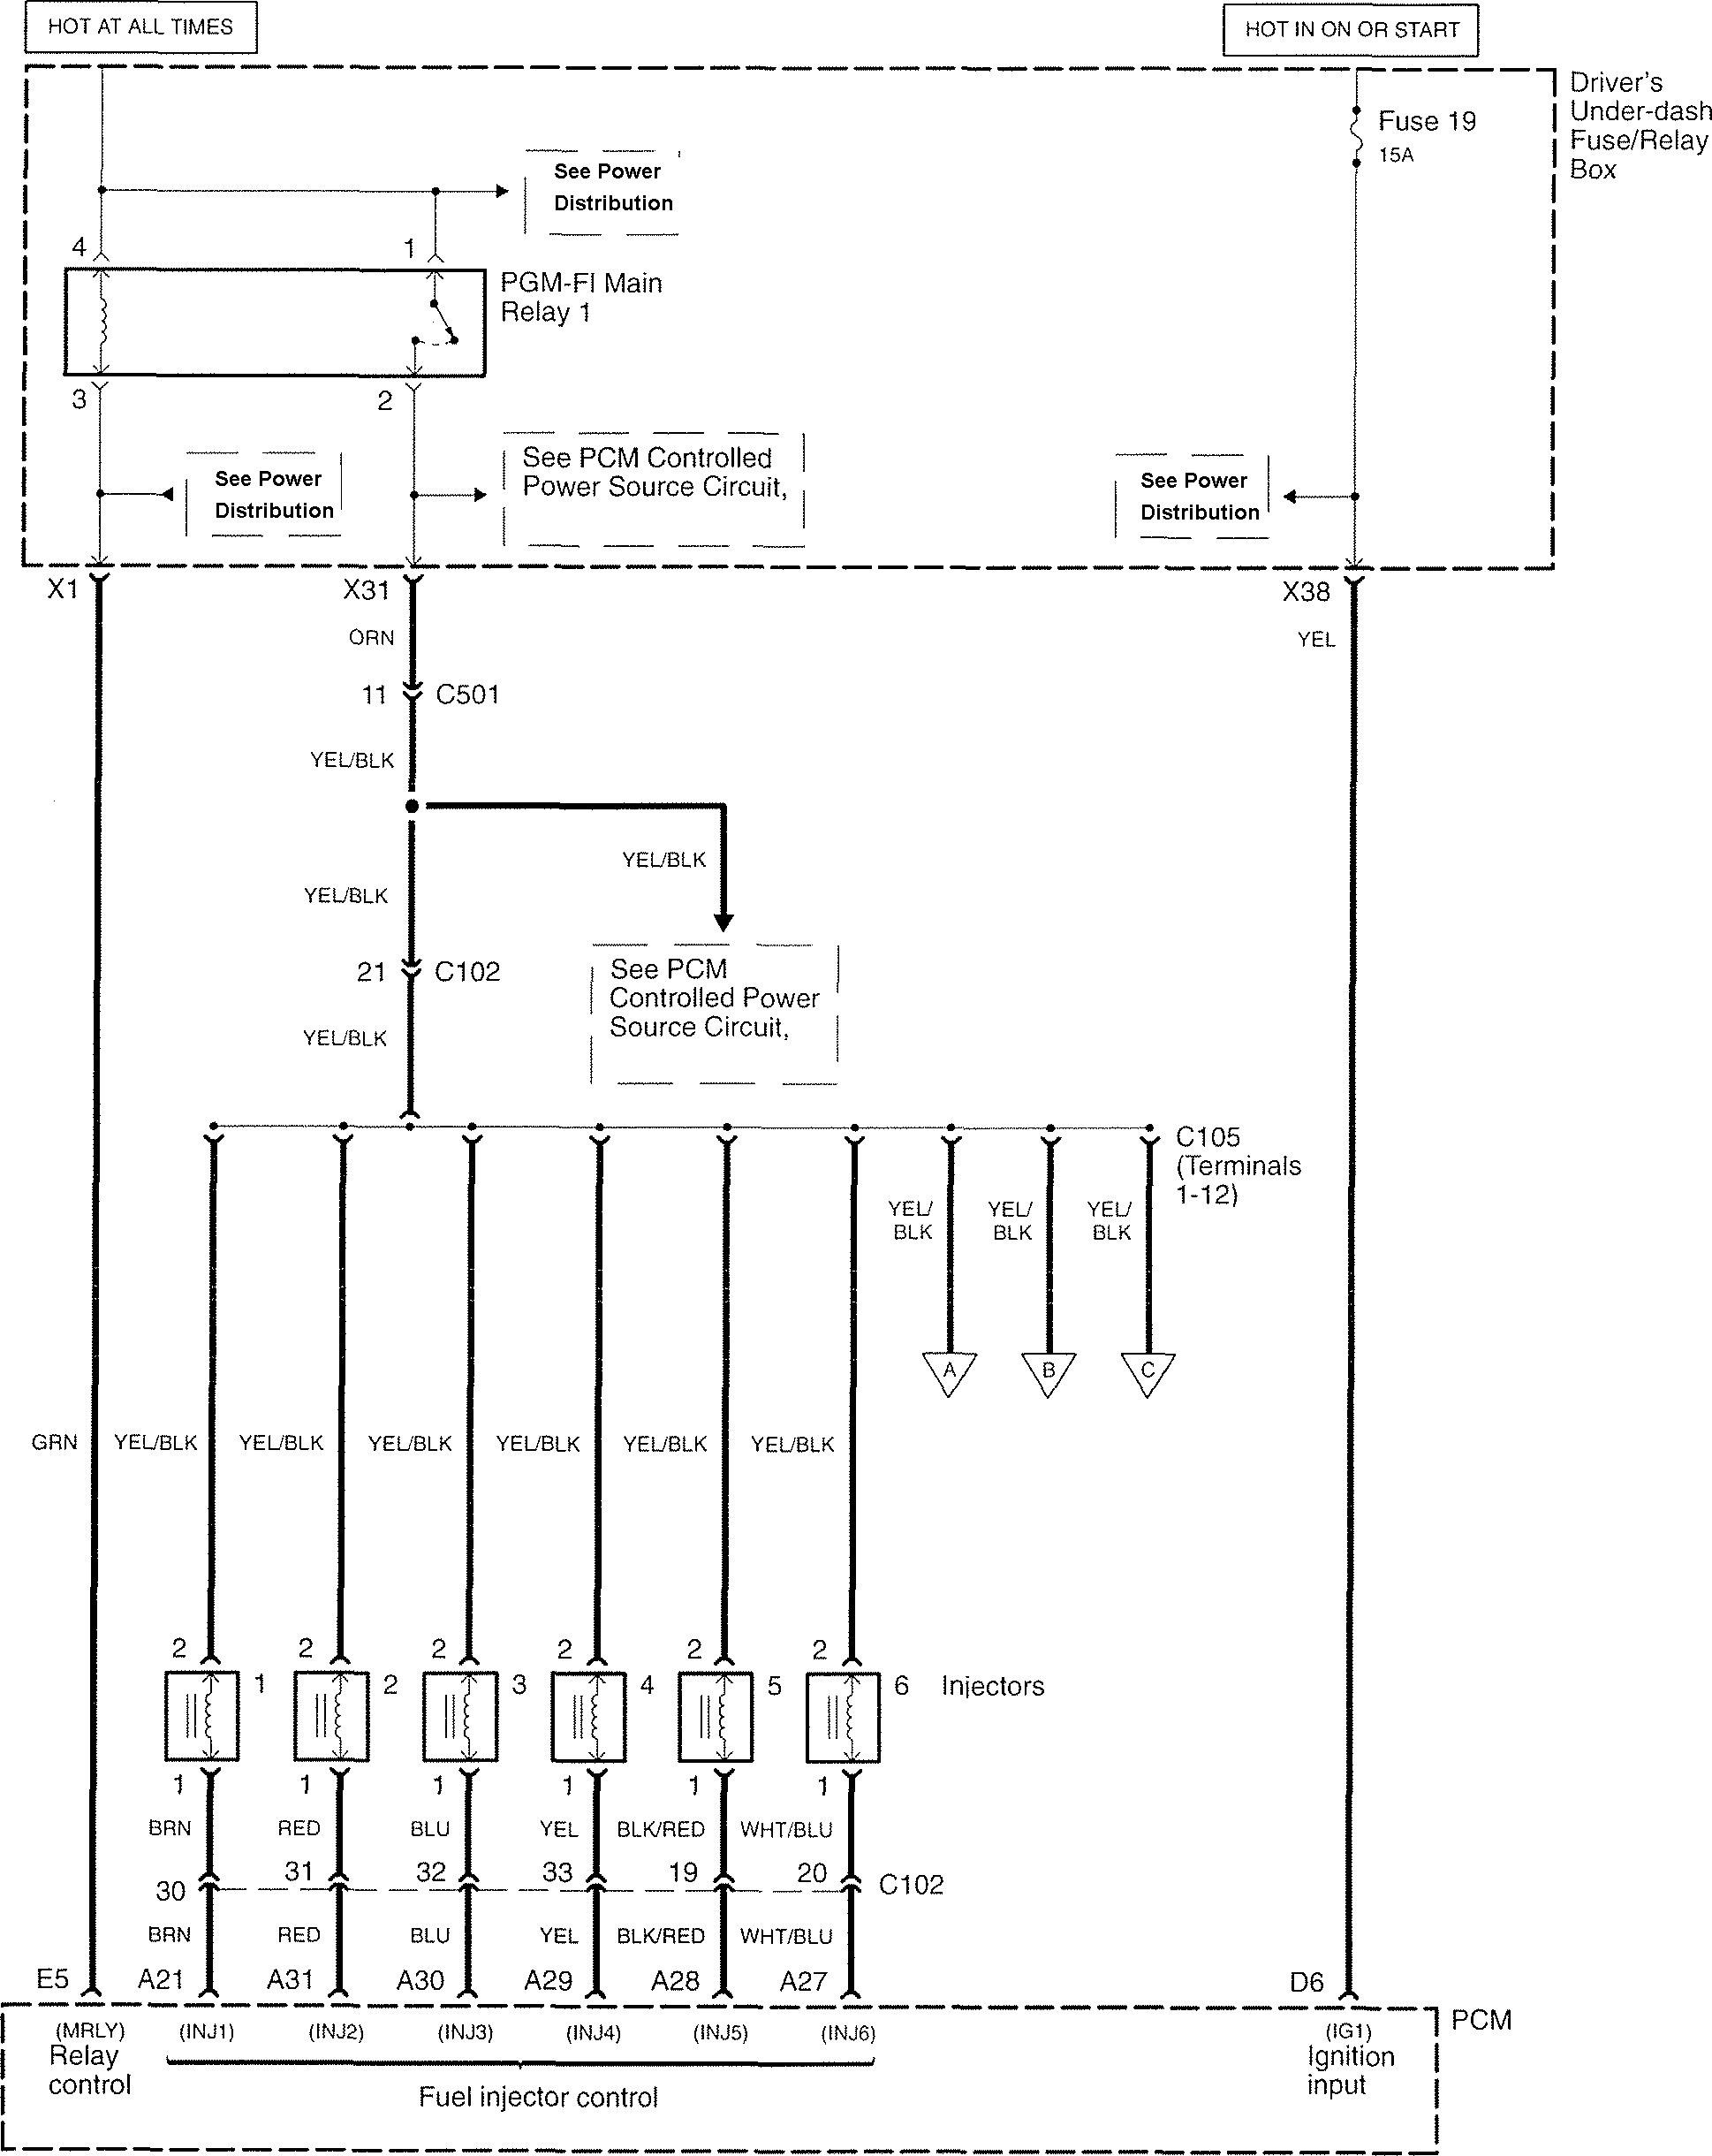 2008 acura rl wiring diagram schematics wiring diagrams \u2022 2005 acura rl on 22s acura rl 2007 2008 wiring diagrams fuel controls carknowledge rh carknowledge info black 2008 acura rl